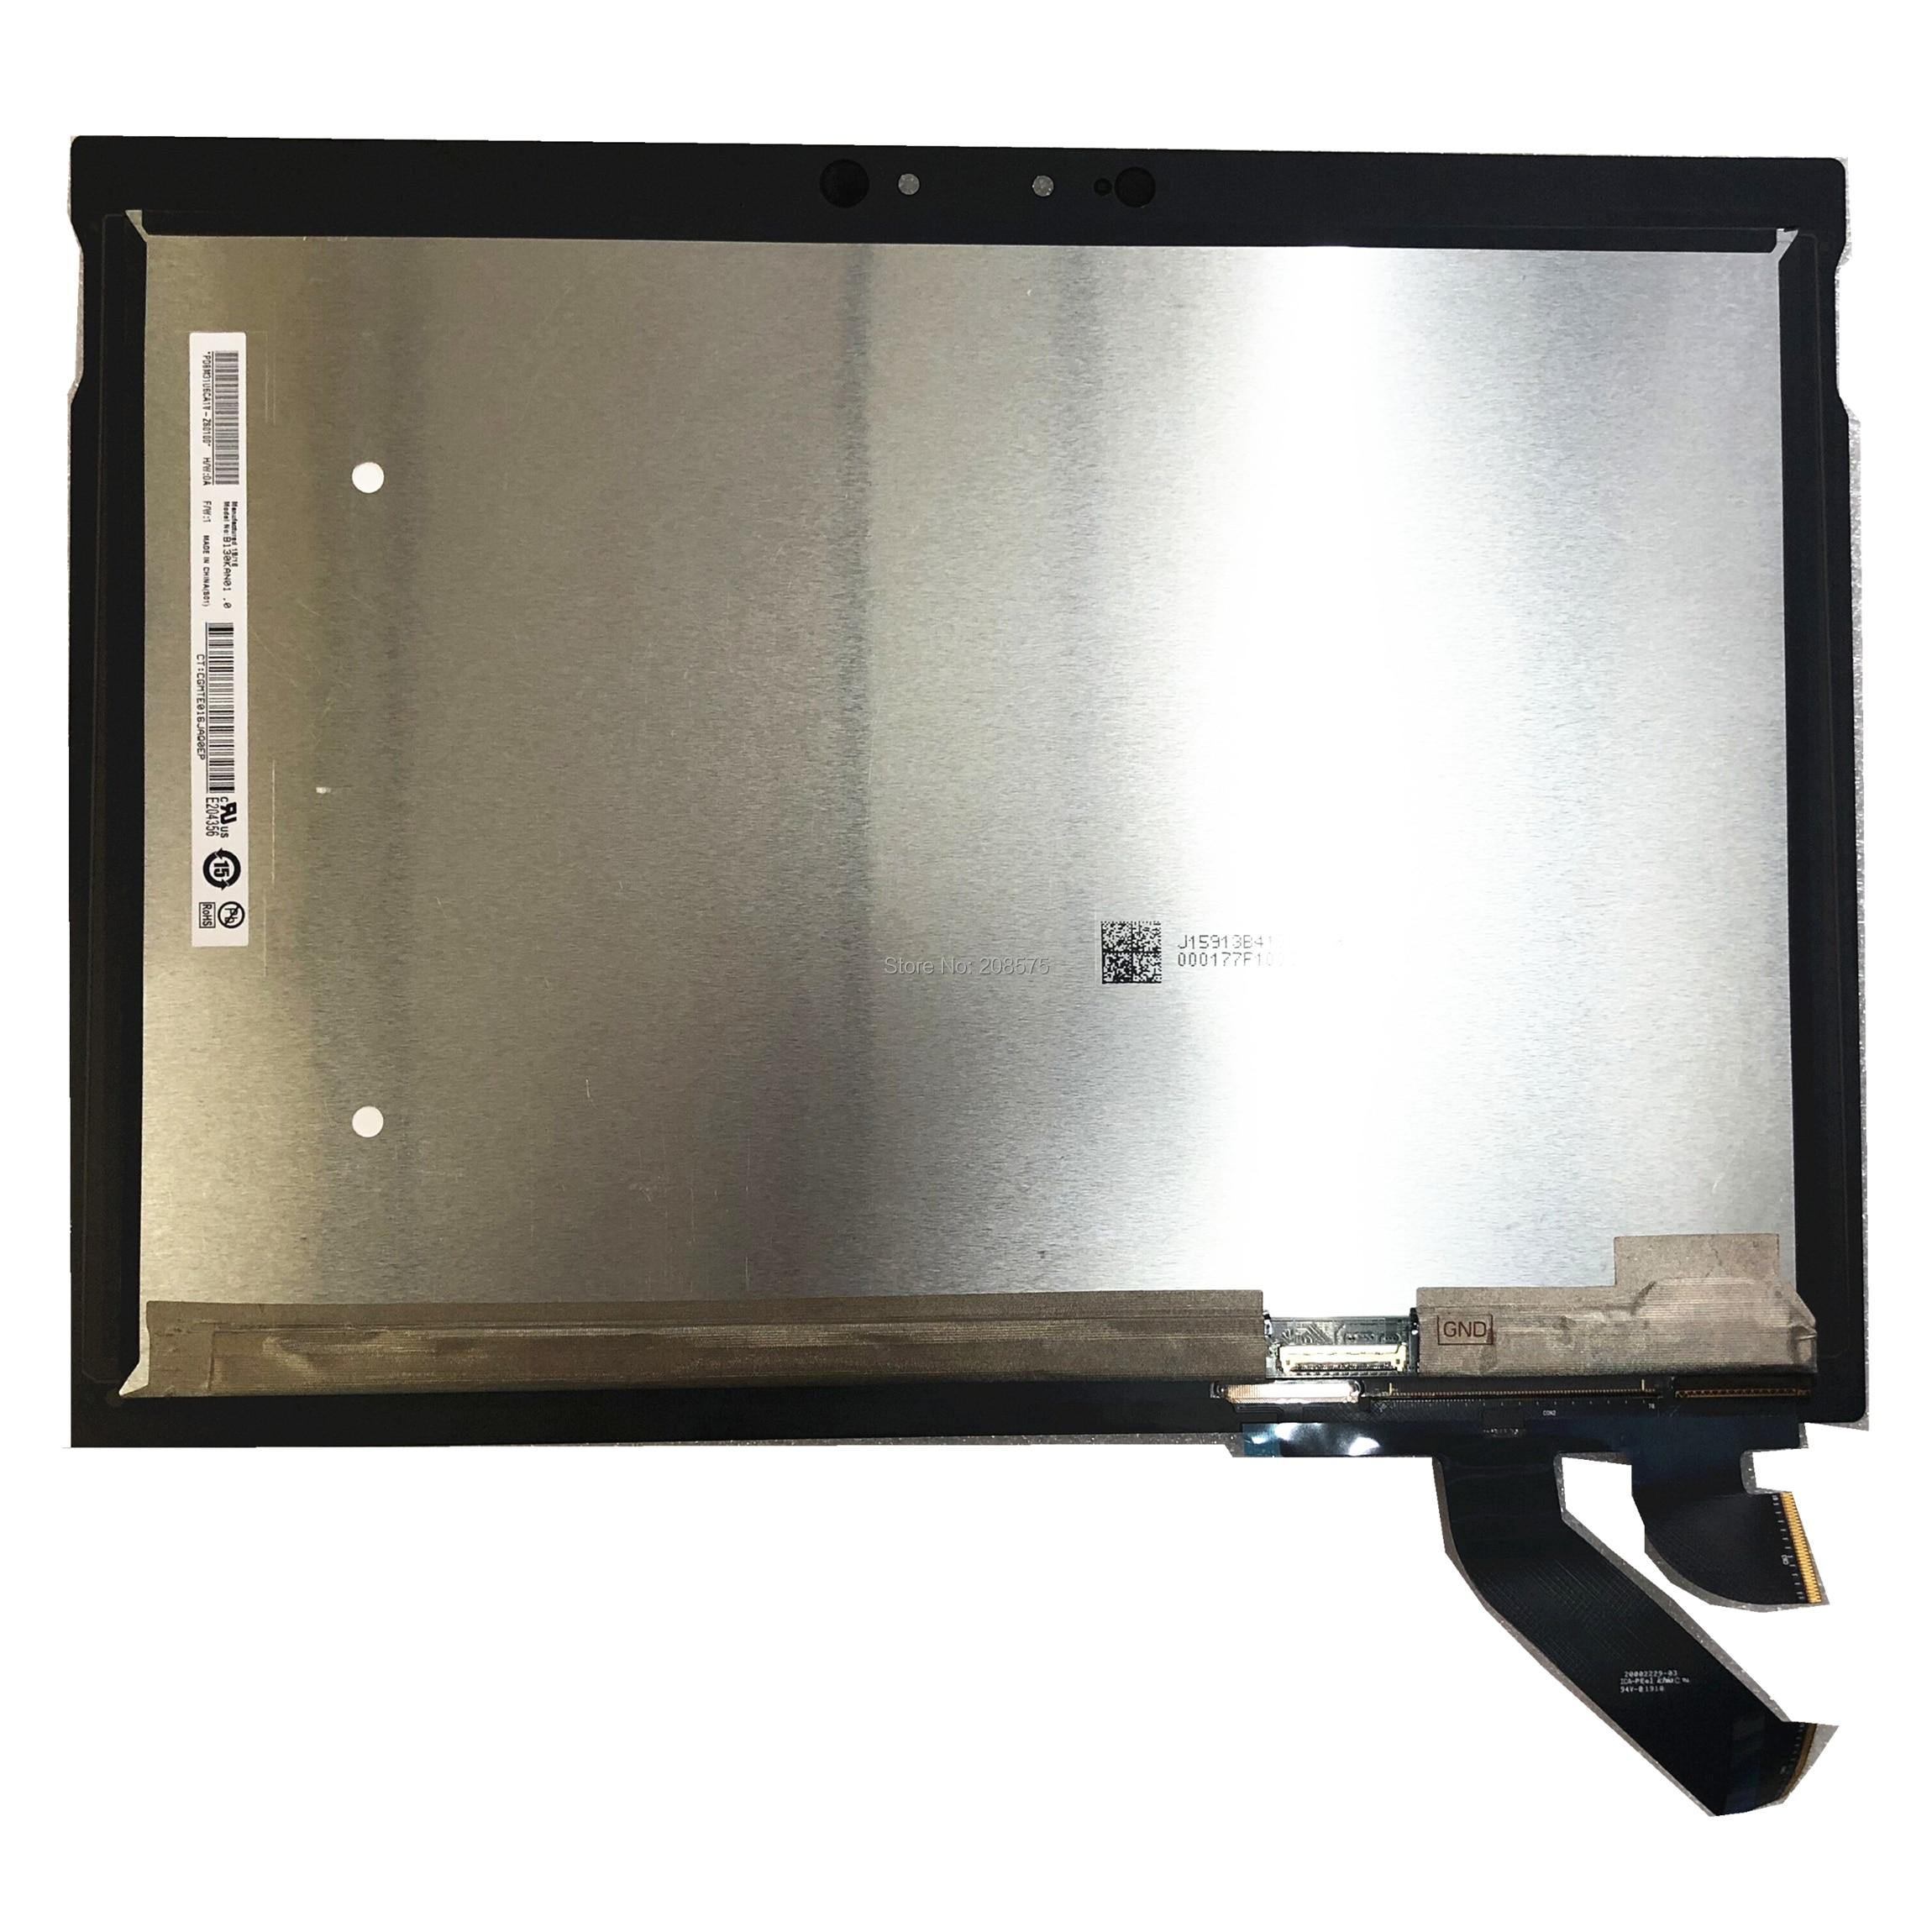 B130KAN01.0 H/W 0A F/W x2 1 LCD LED Tela Sensível Ao Toque Para HP Elite 1013 40 G3 Laptop Lcd Assembléia substituição 1920*1280 EDP PINOS